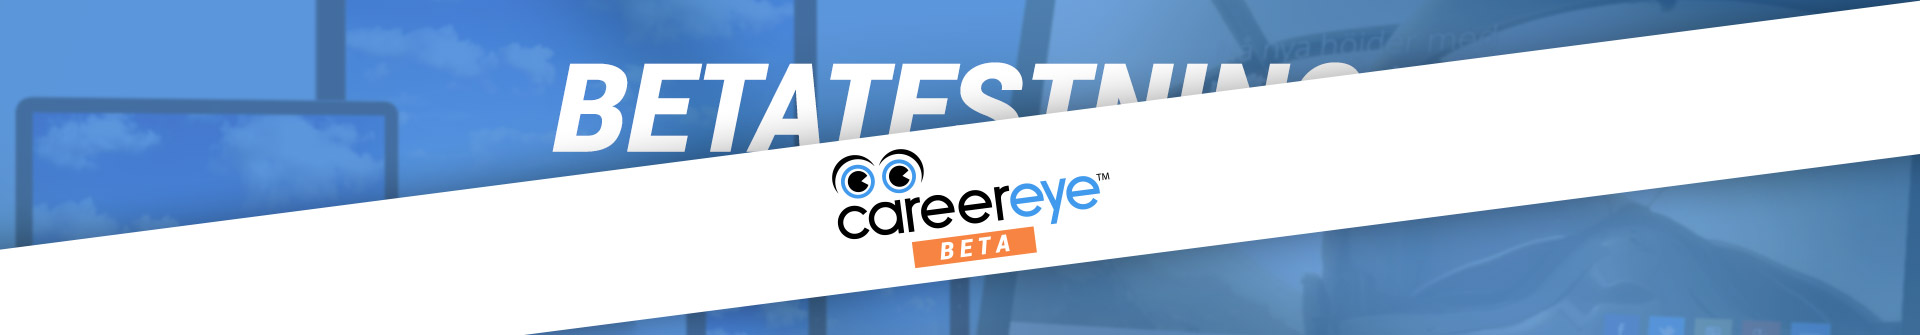 Careereye Beta Launch, Sweden